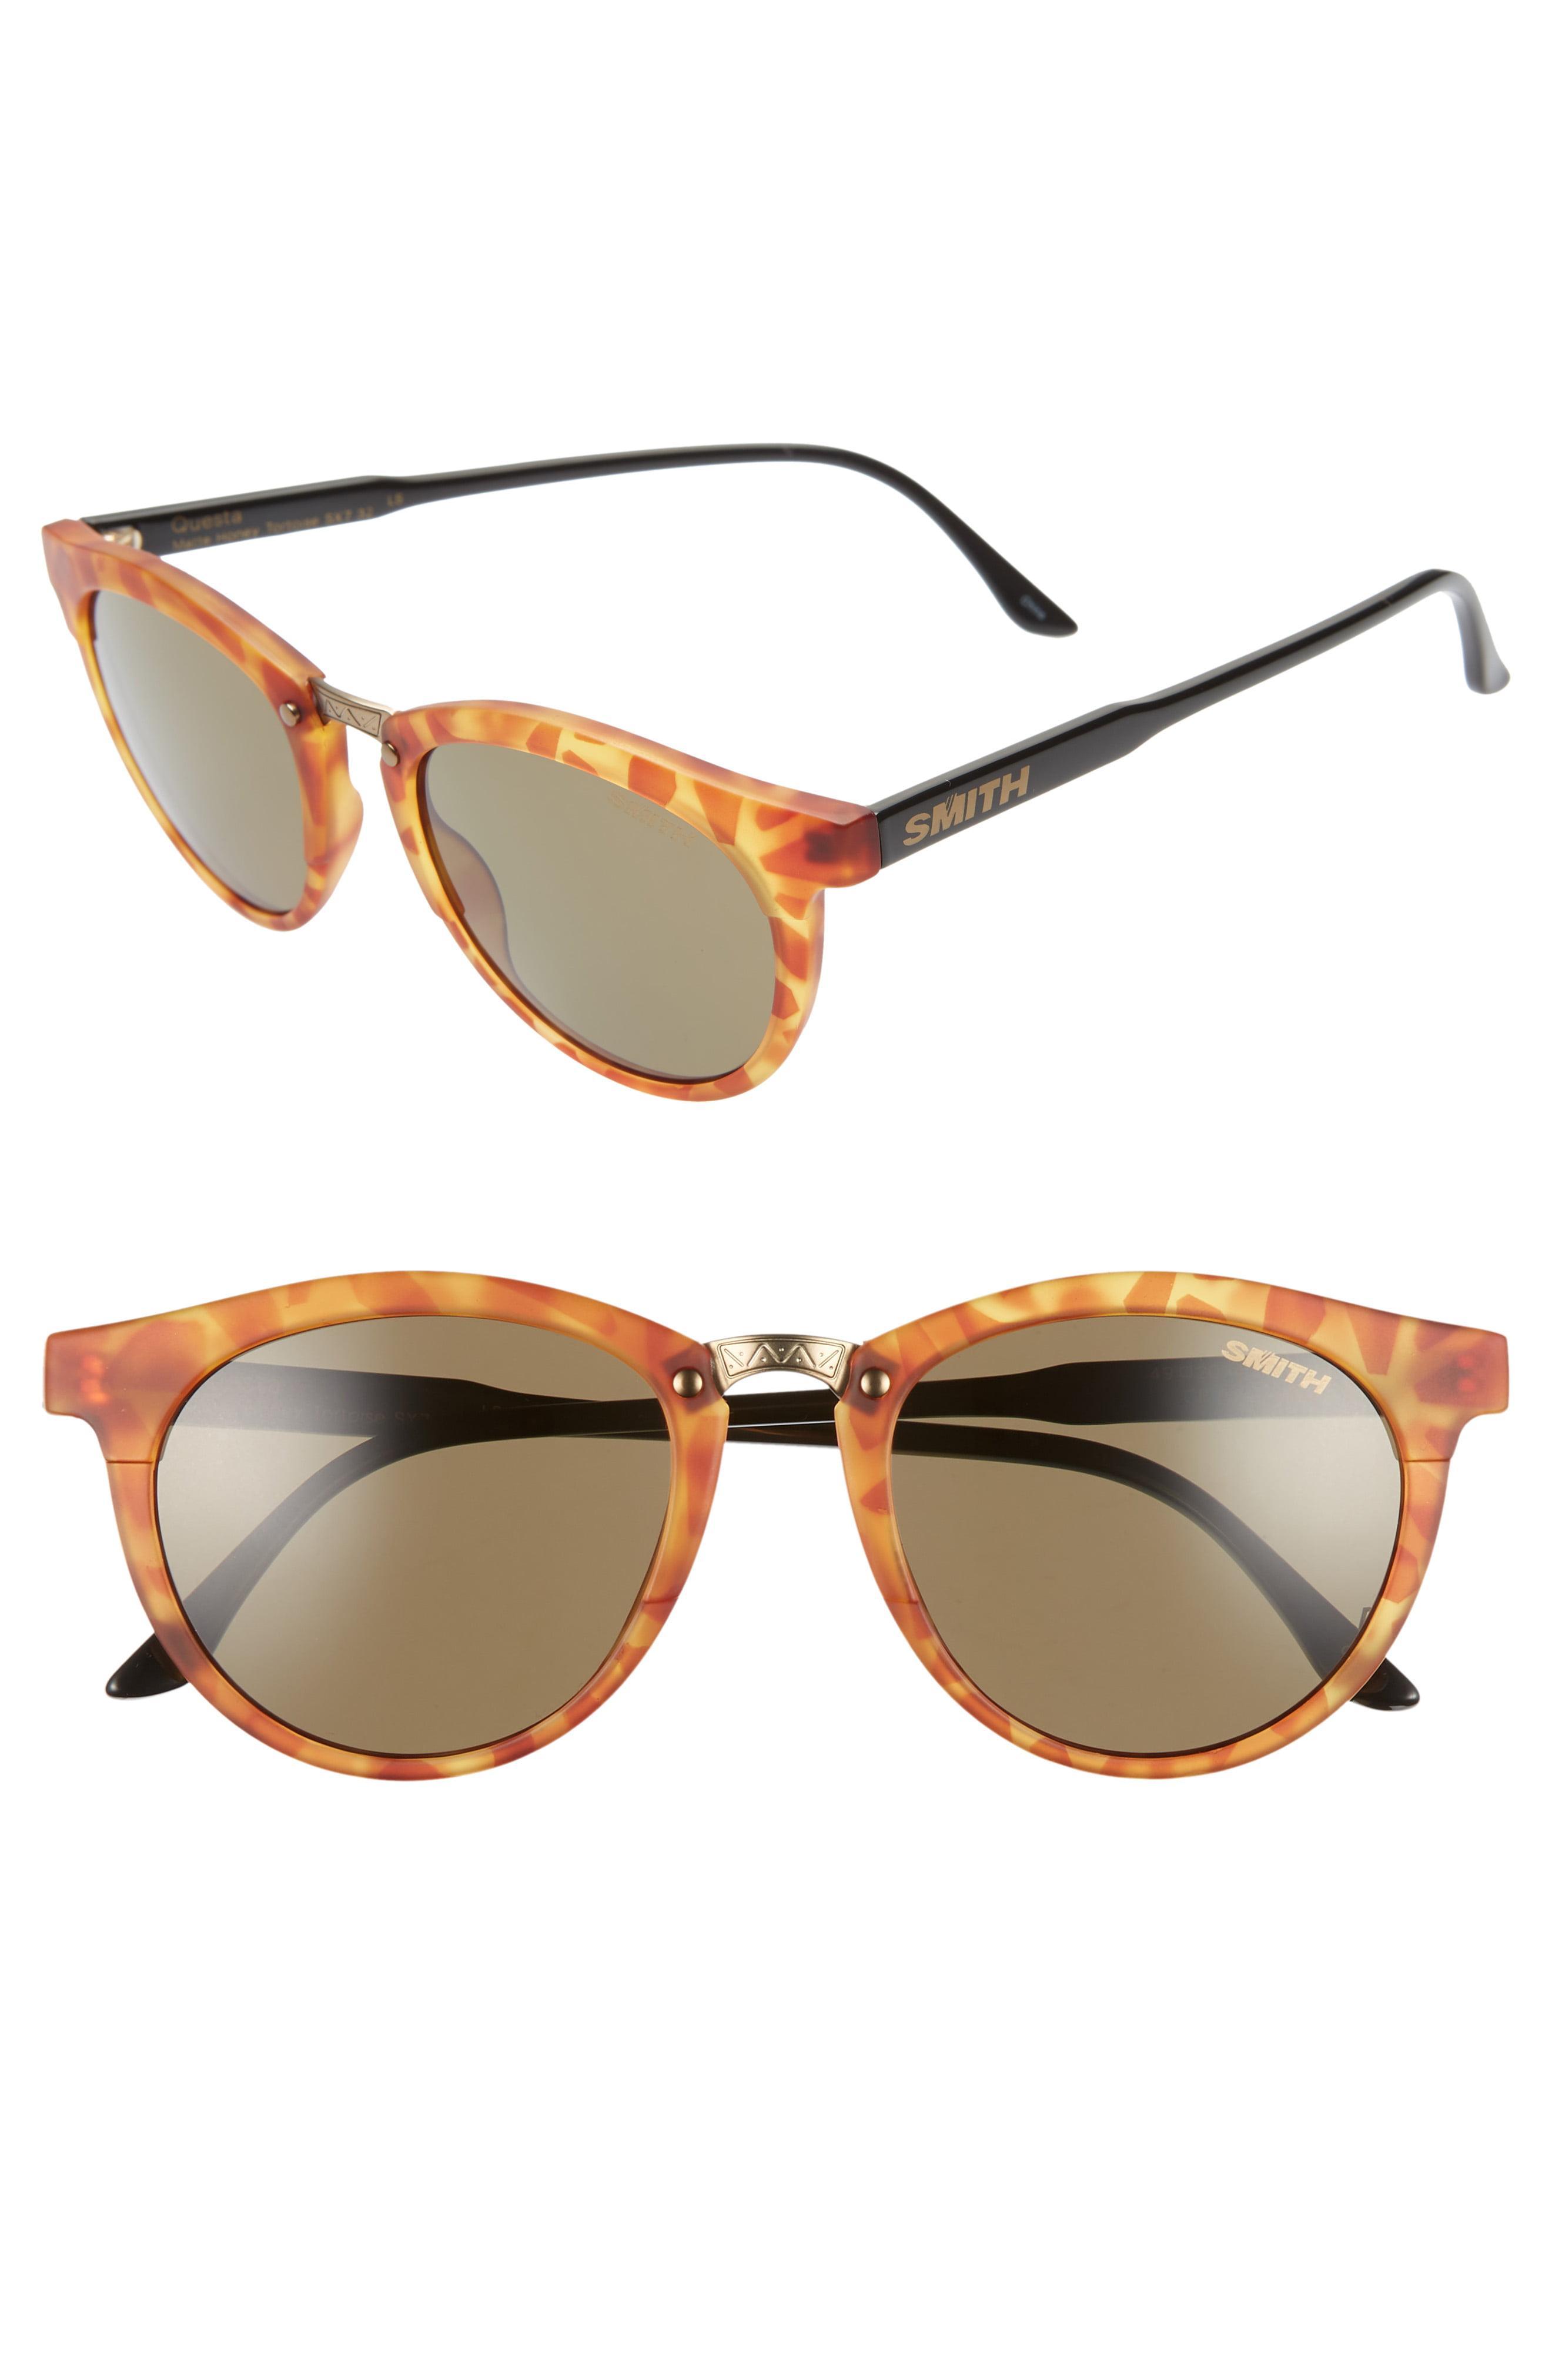 068e15aae8 Lyst - Smith Questa 49mm Chromapop Polarized Sunglasses - Honey ...